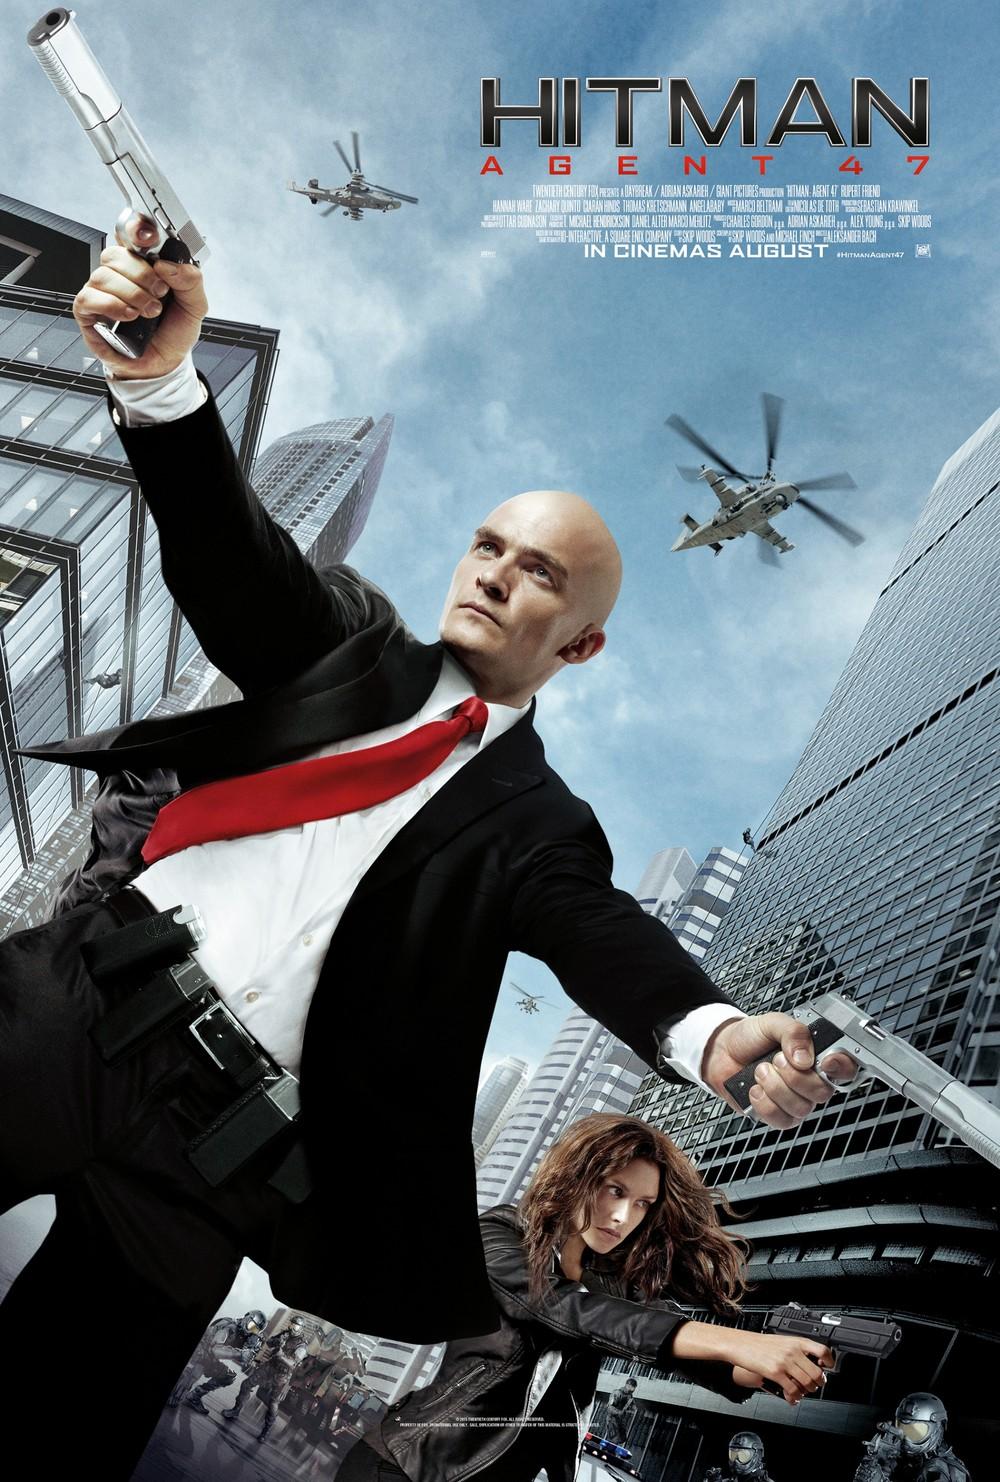 Hitman Agent 47 Movie4k